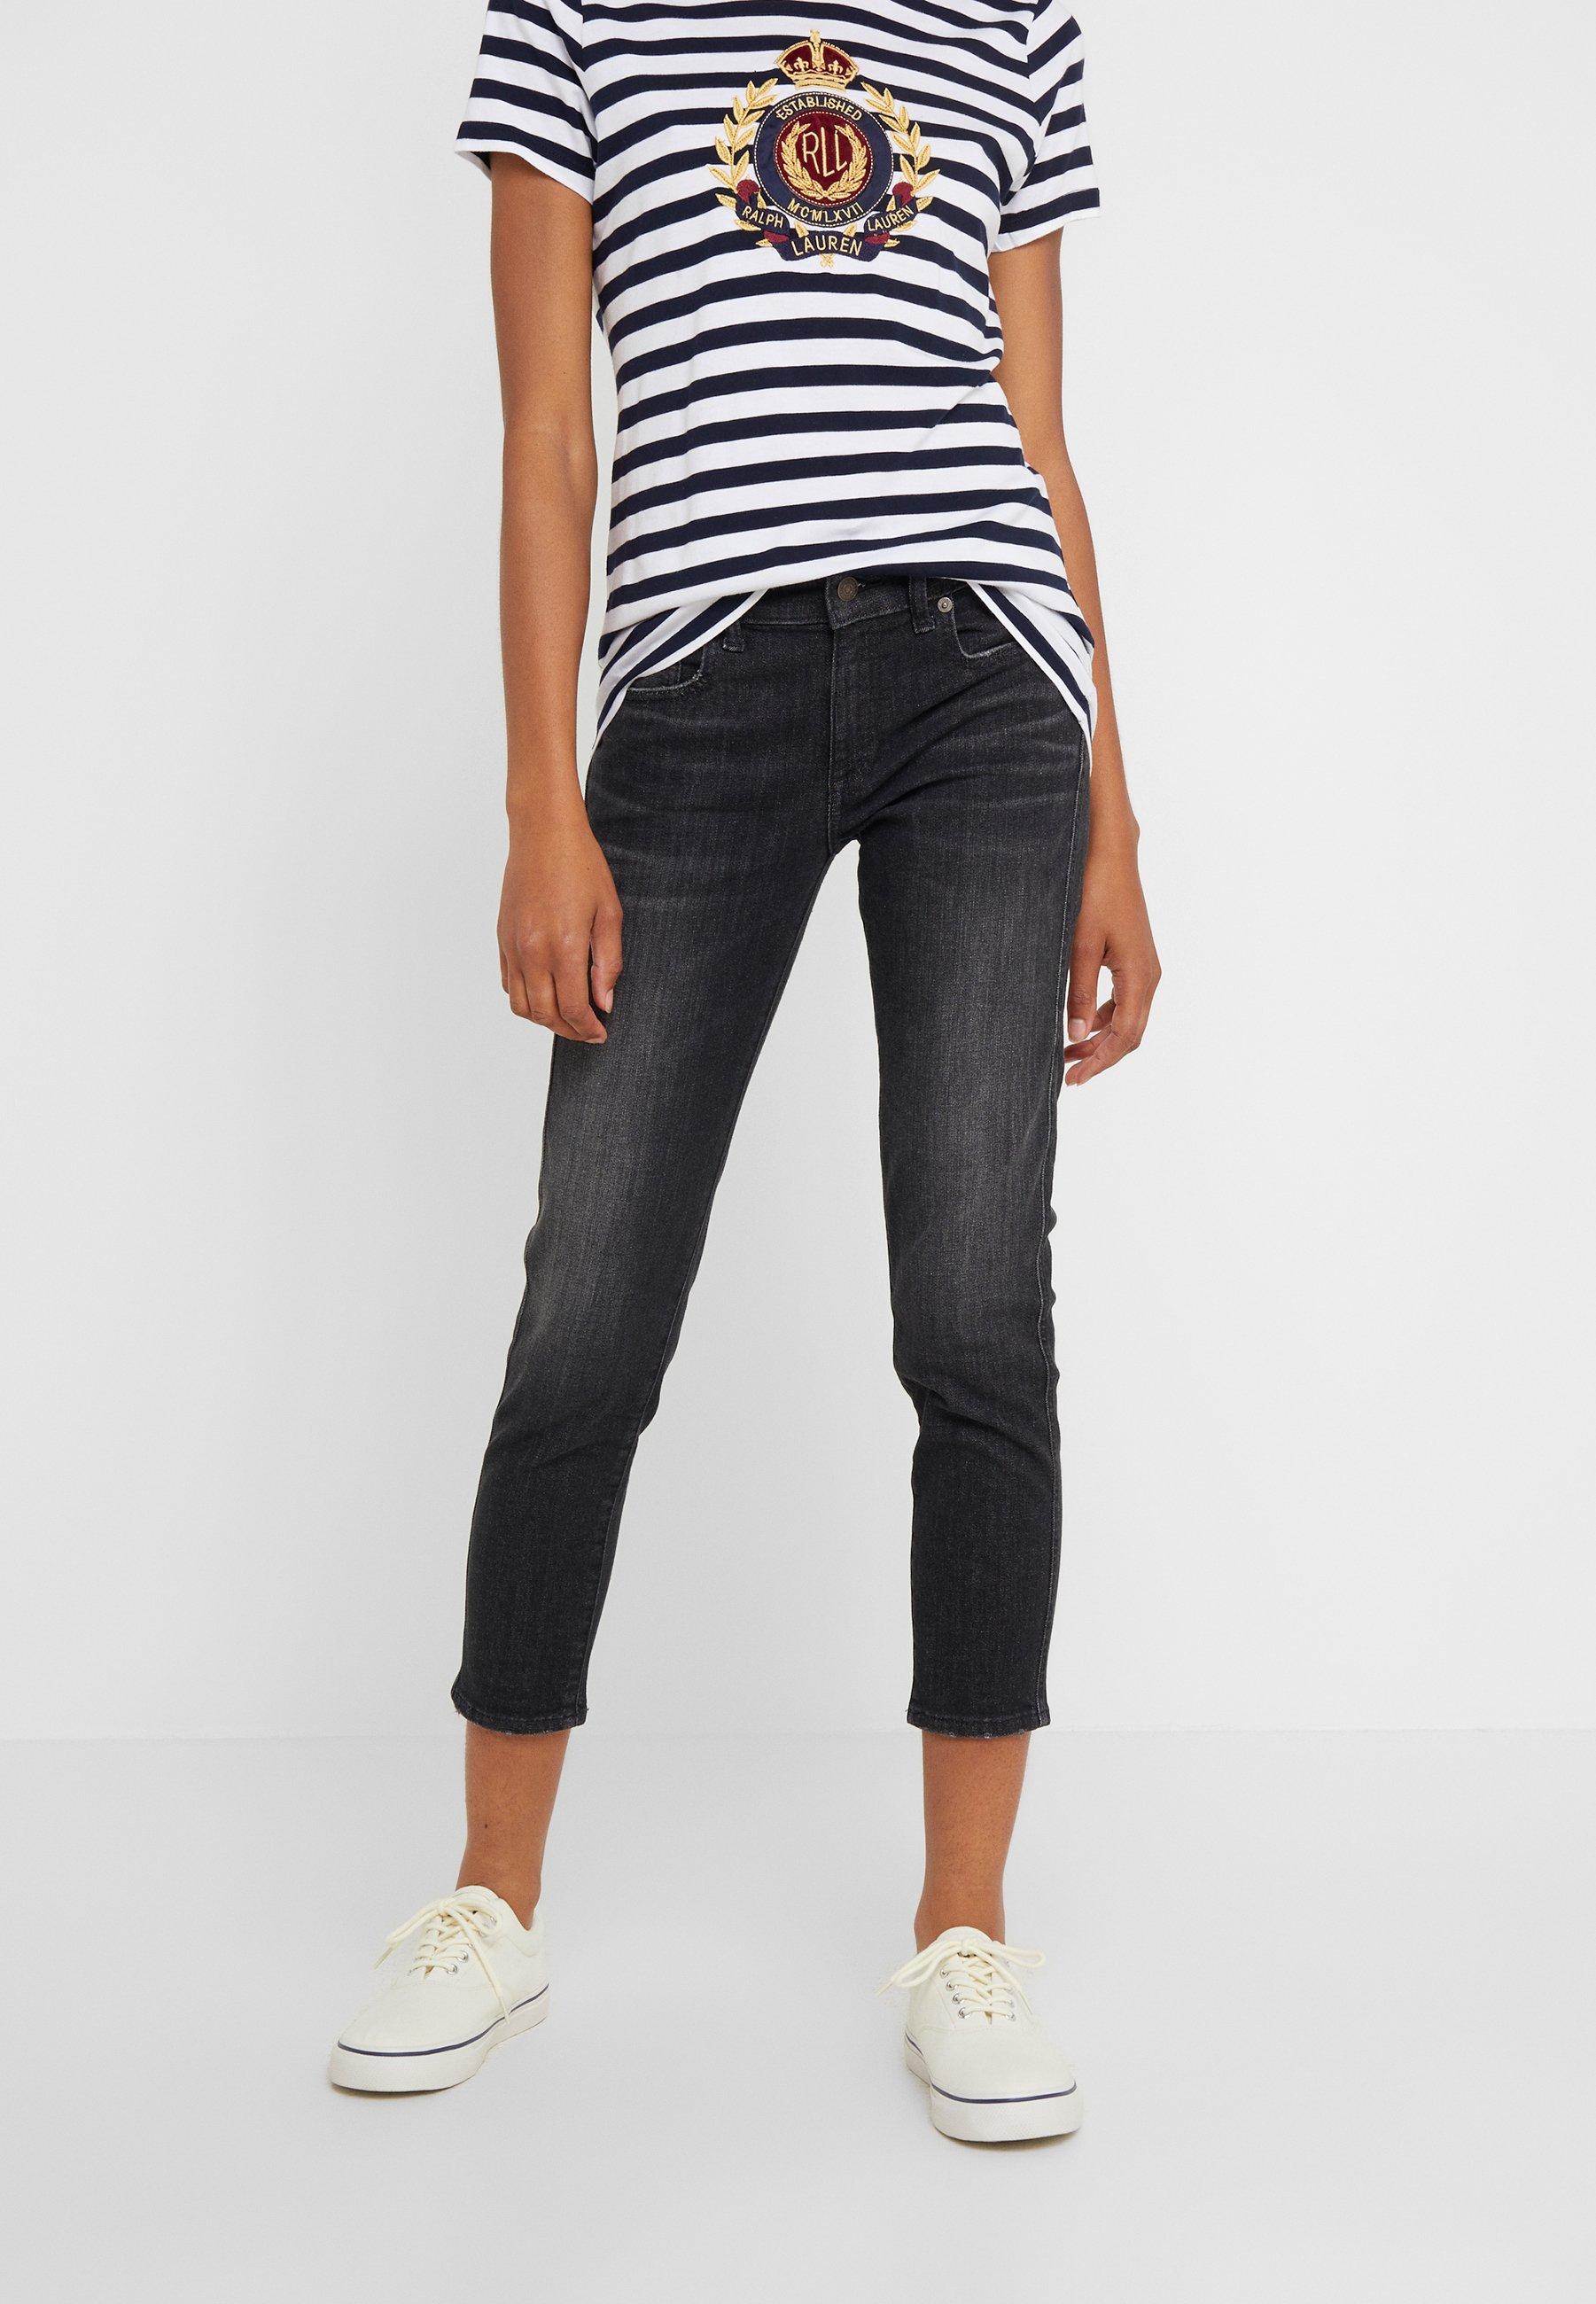 Ralph Ash Washed Skinny Black Polo Lauren WashJeans vmN8n0w